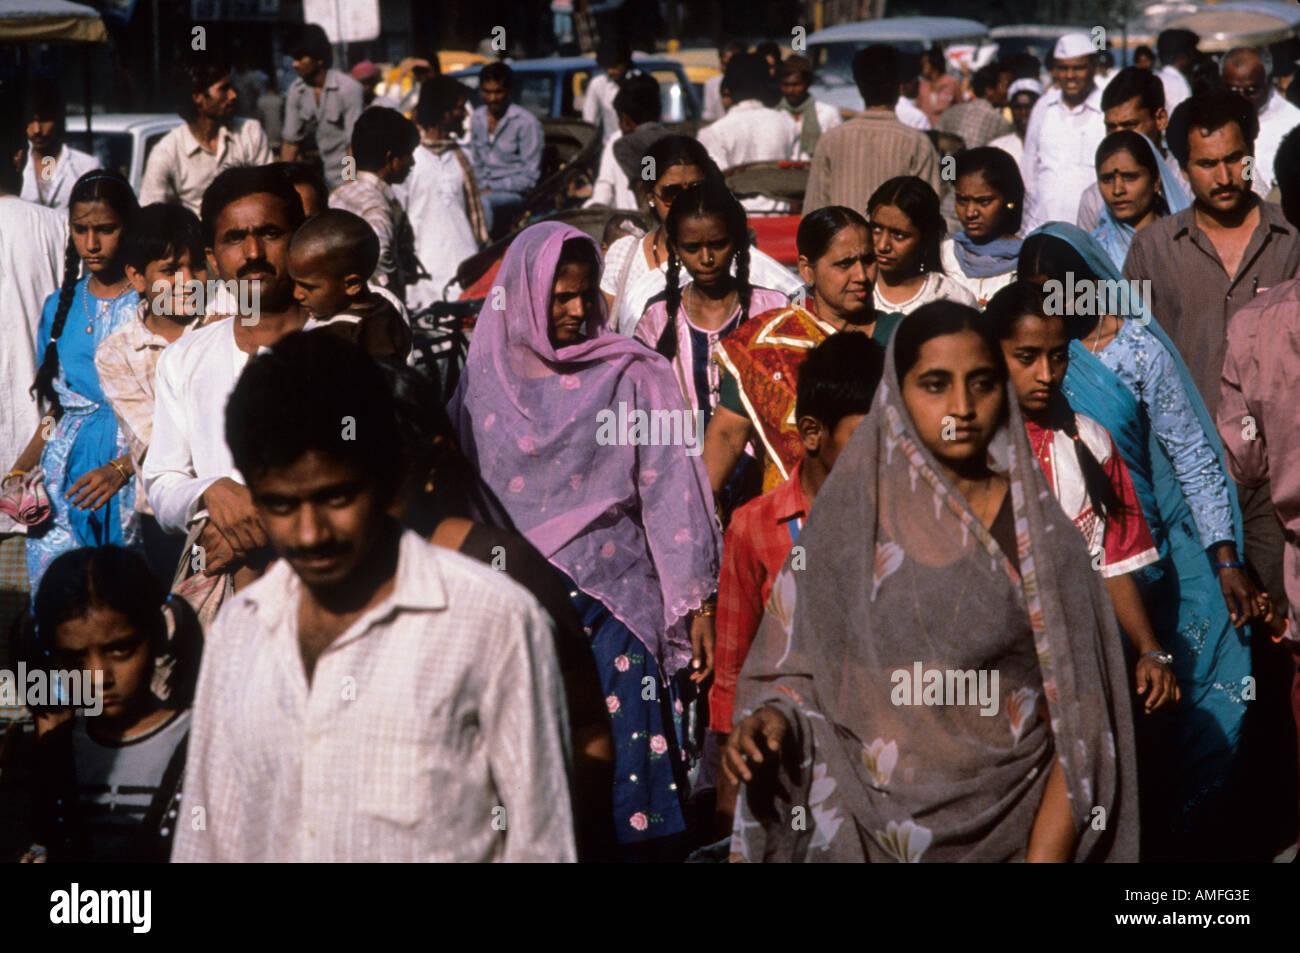 world population - Stock Image